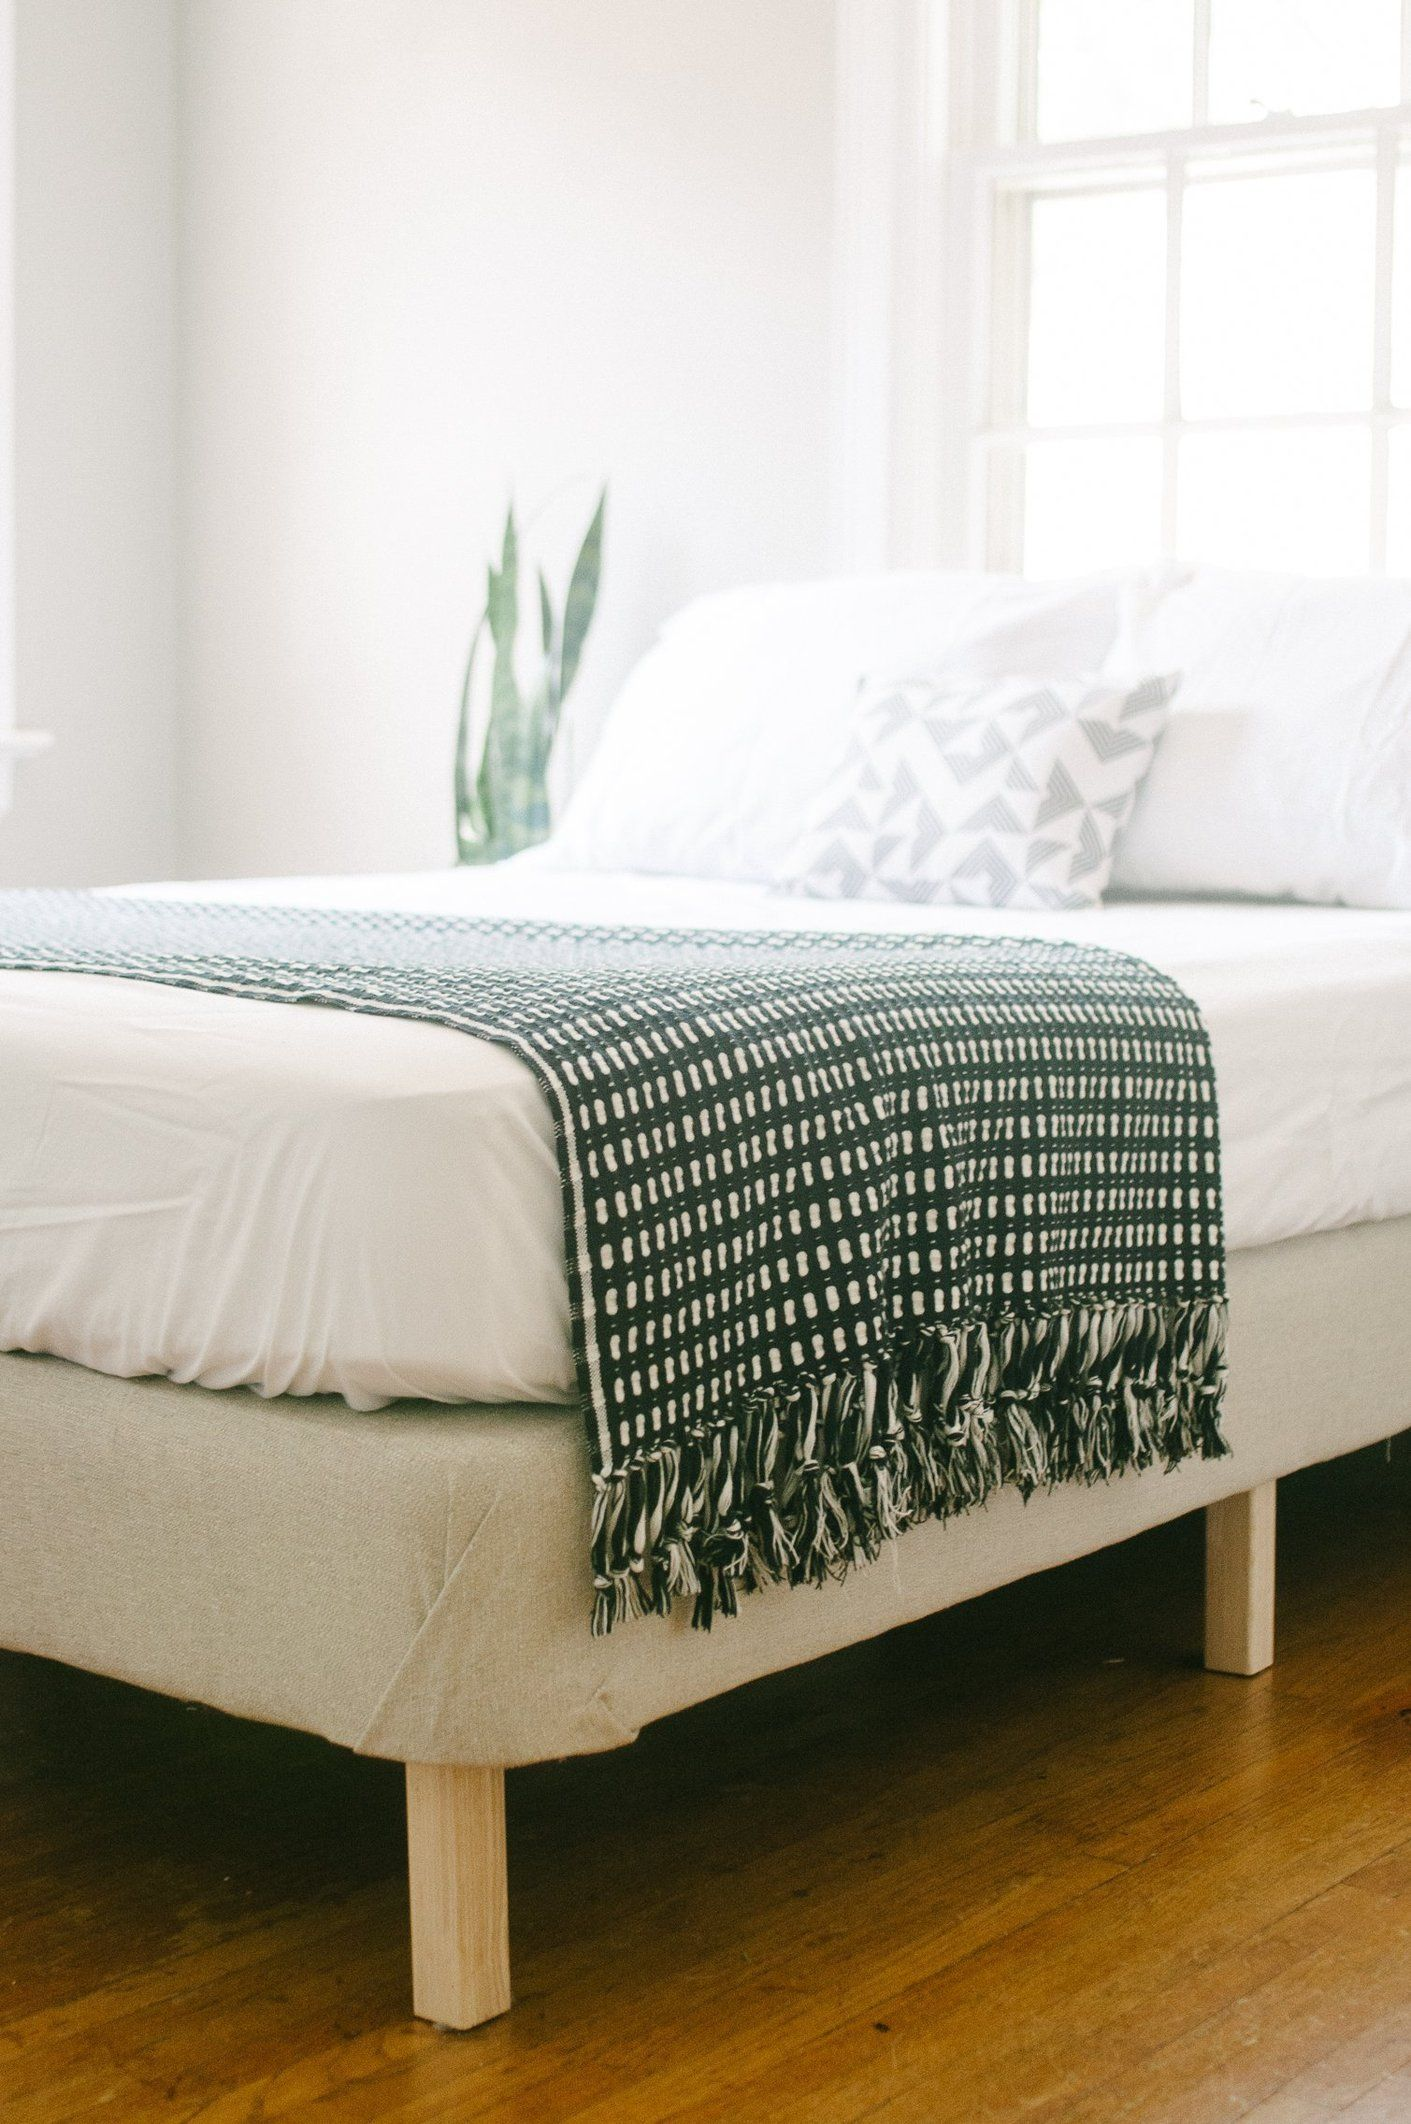 Best 25+ Bed frames for sale ideas on Pinterest | Bed frame sale, Kitchen  decor and Kitchen decor online